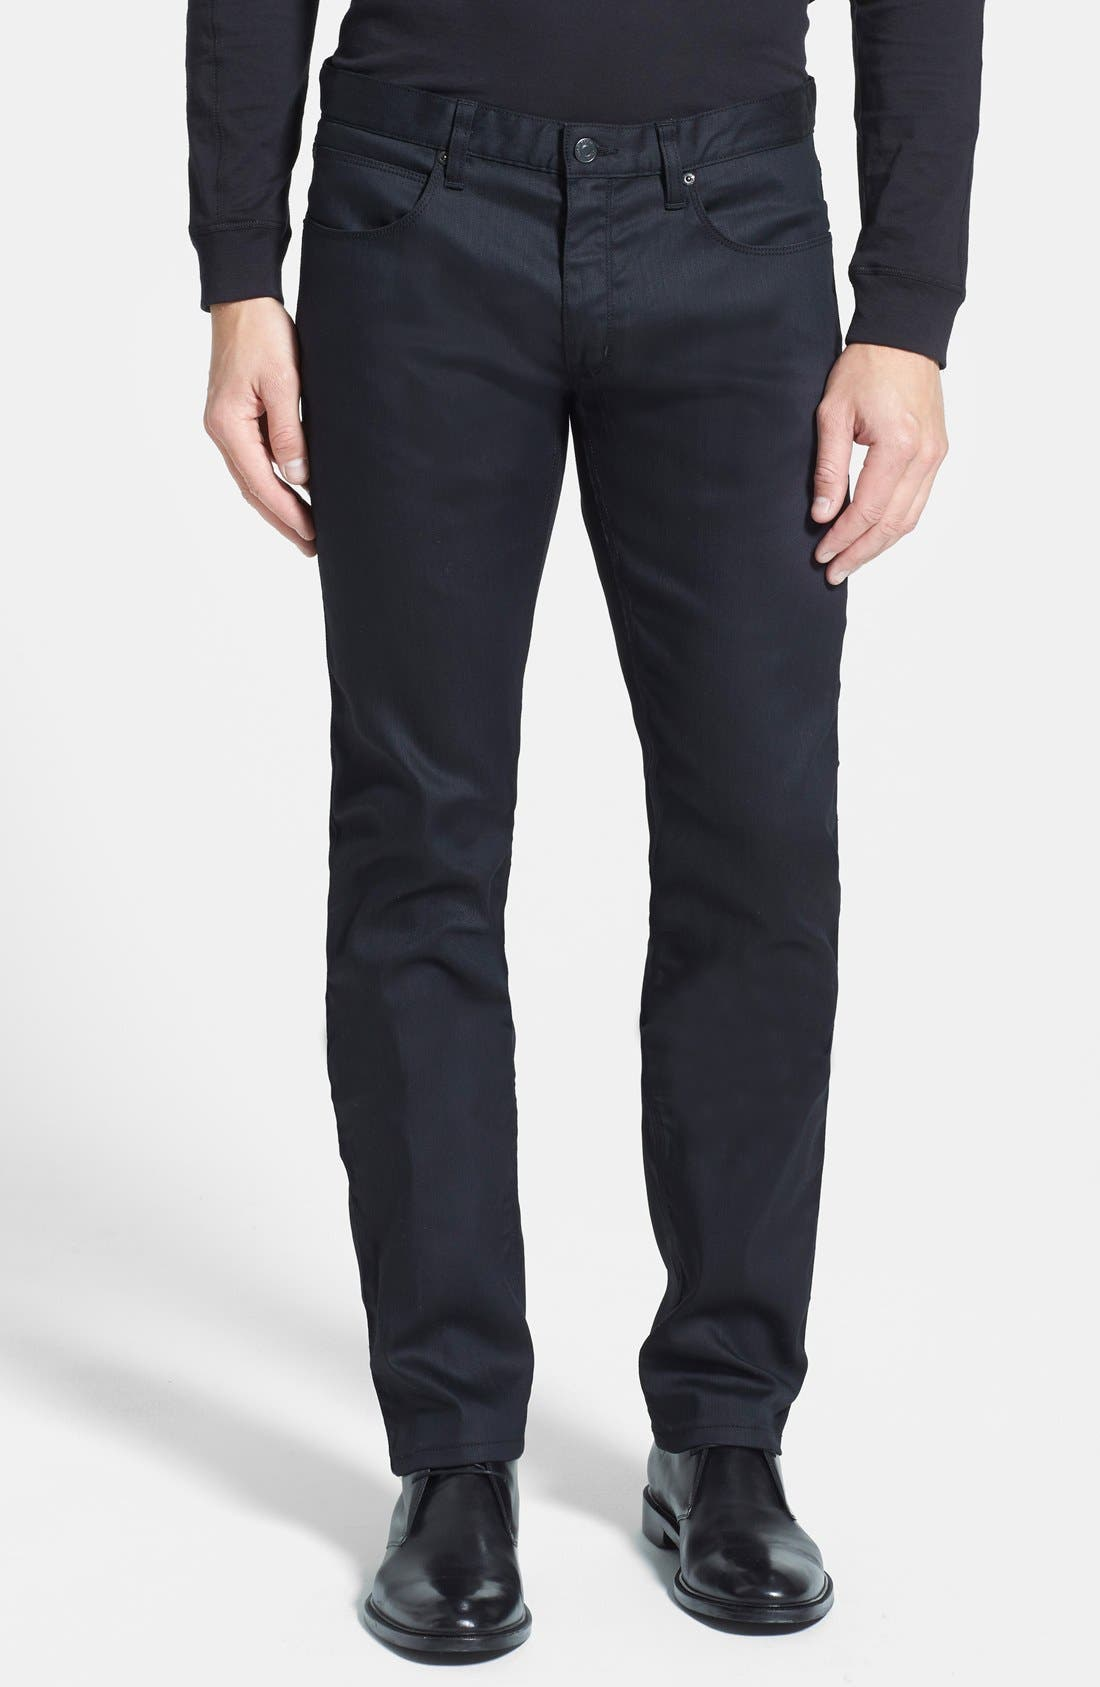 HUGO '708' Slim Fit Jeans,                             Main thumbnail 1, color,